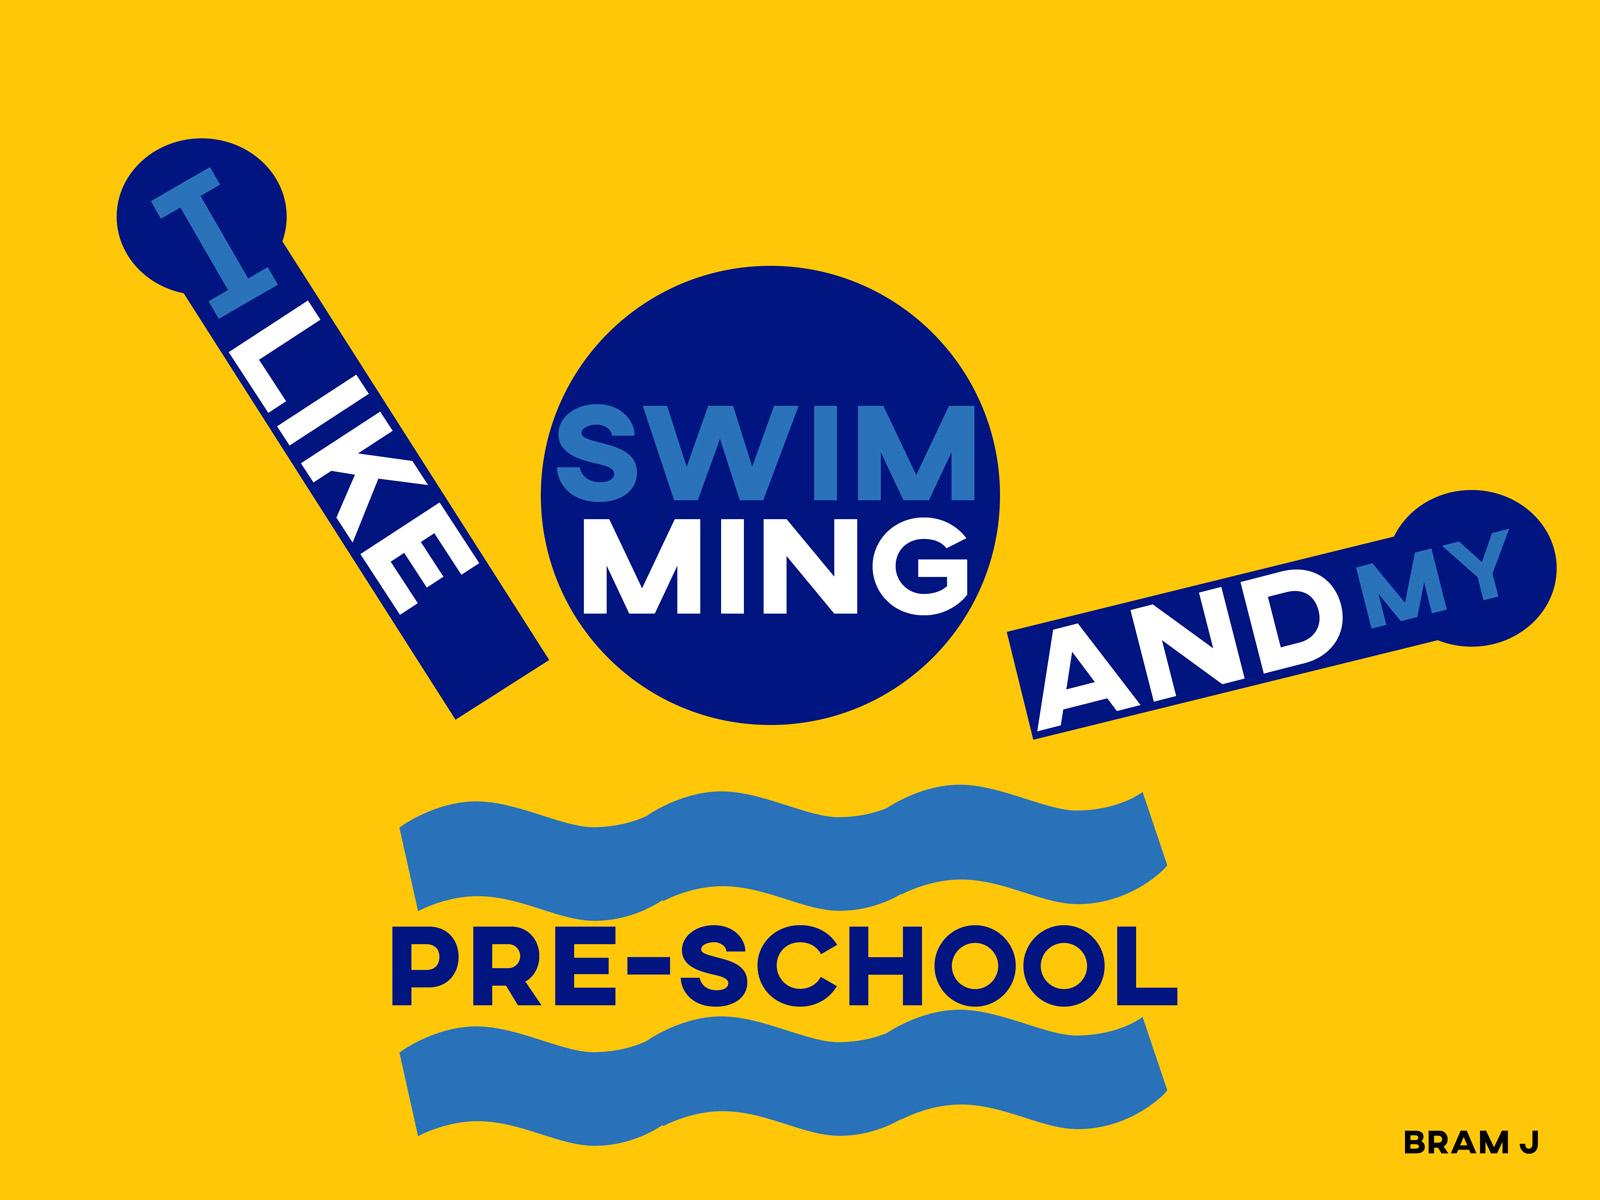 I like swimming and my pre-school.